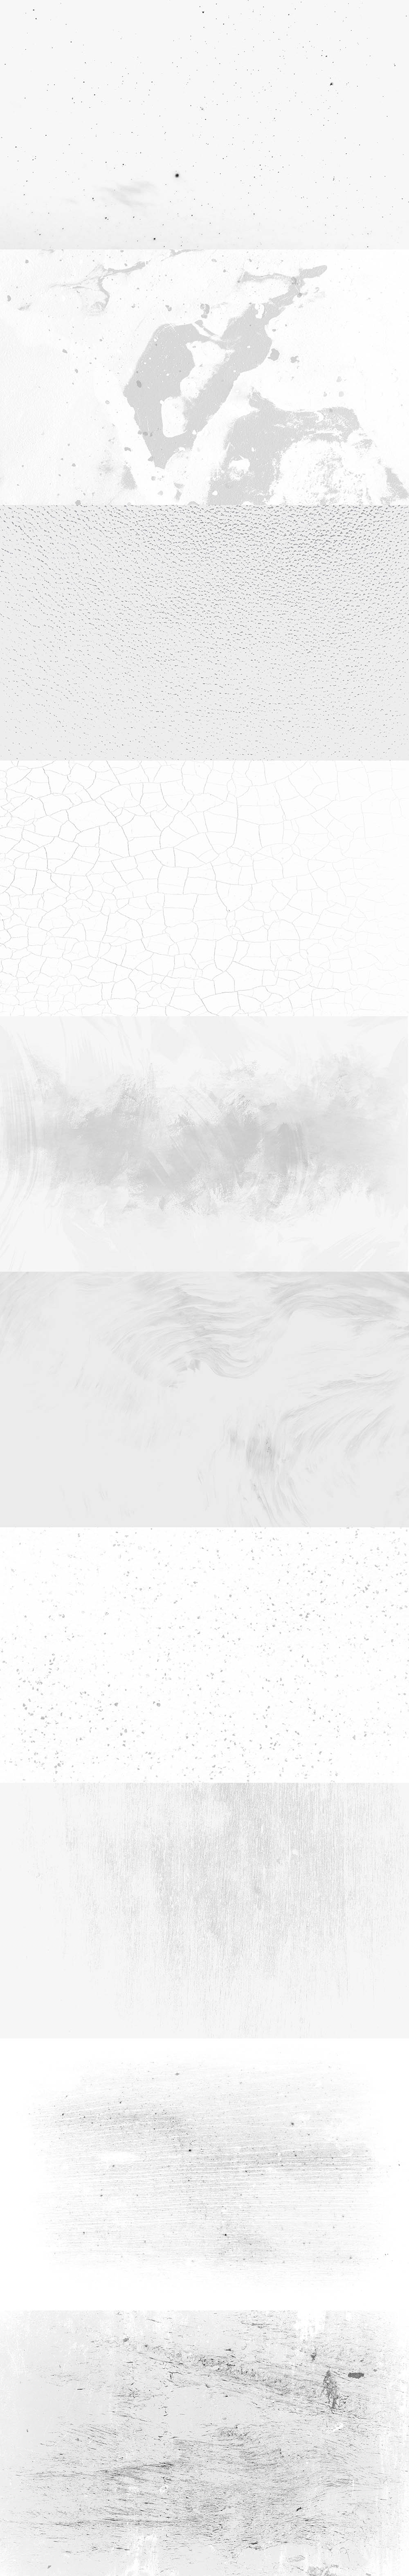 Free White Subtle Textures